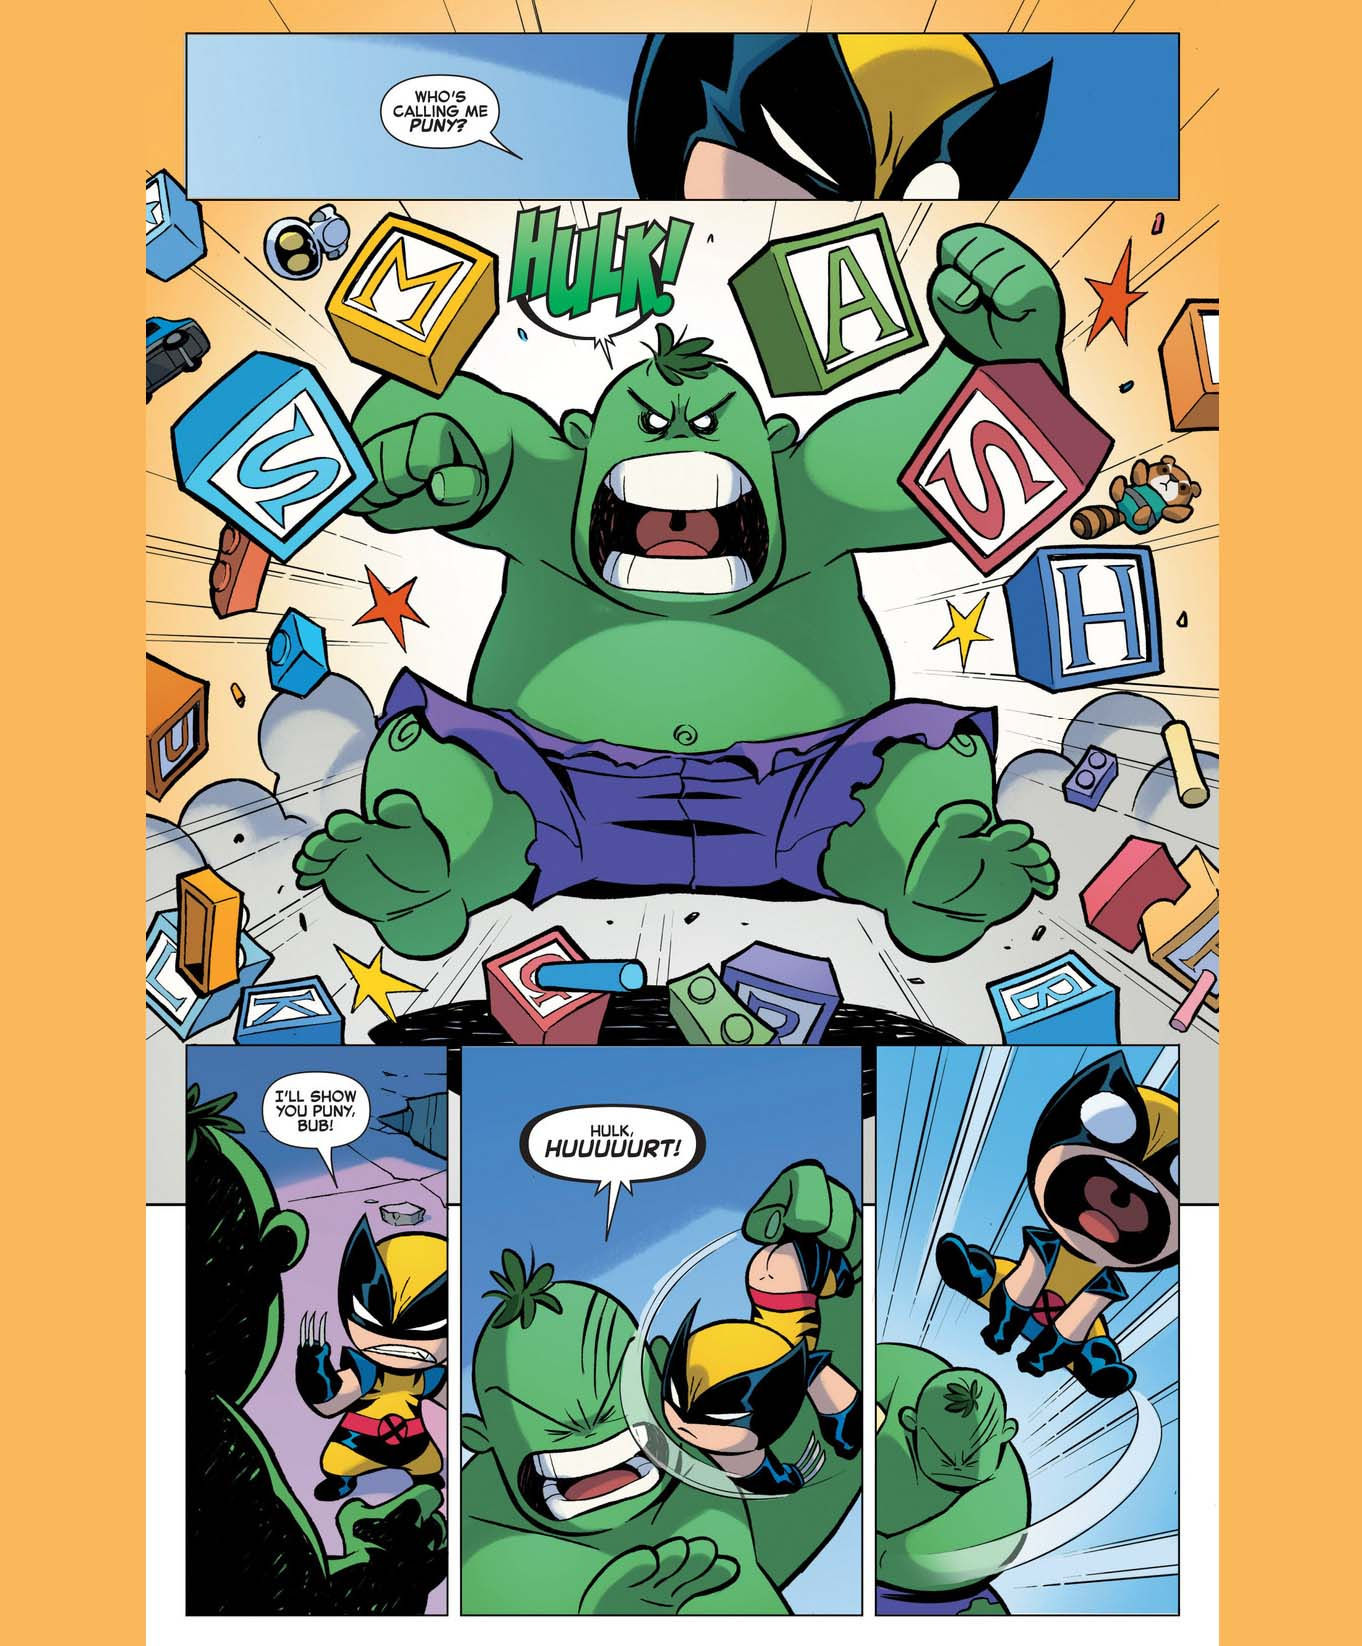 Baby Wolverine VS Baby Hulk | Comicnewbies X Babies Nightcrawler